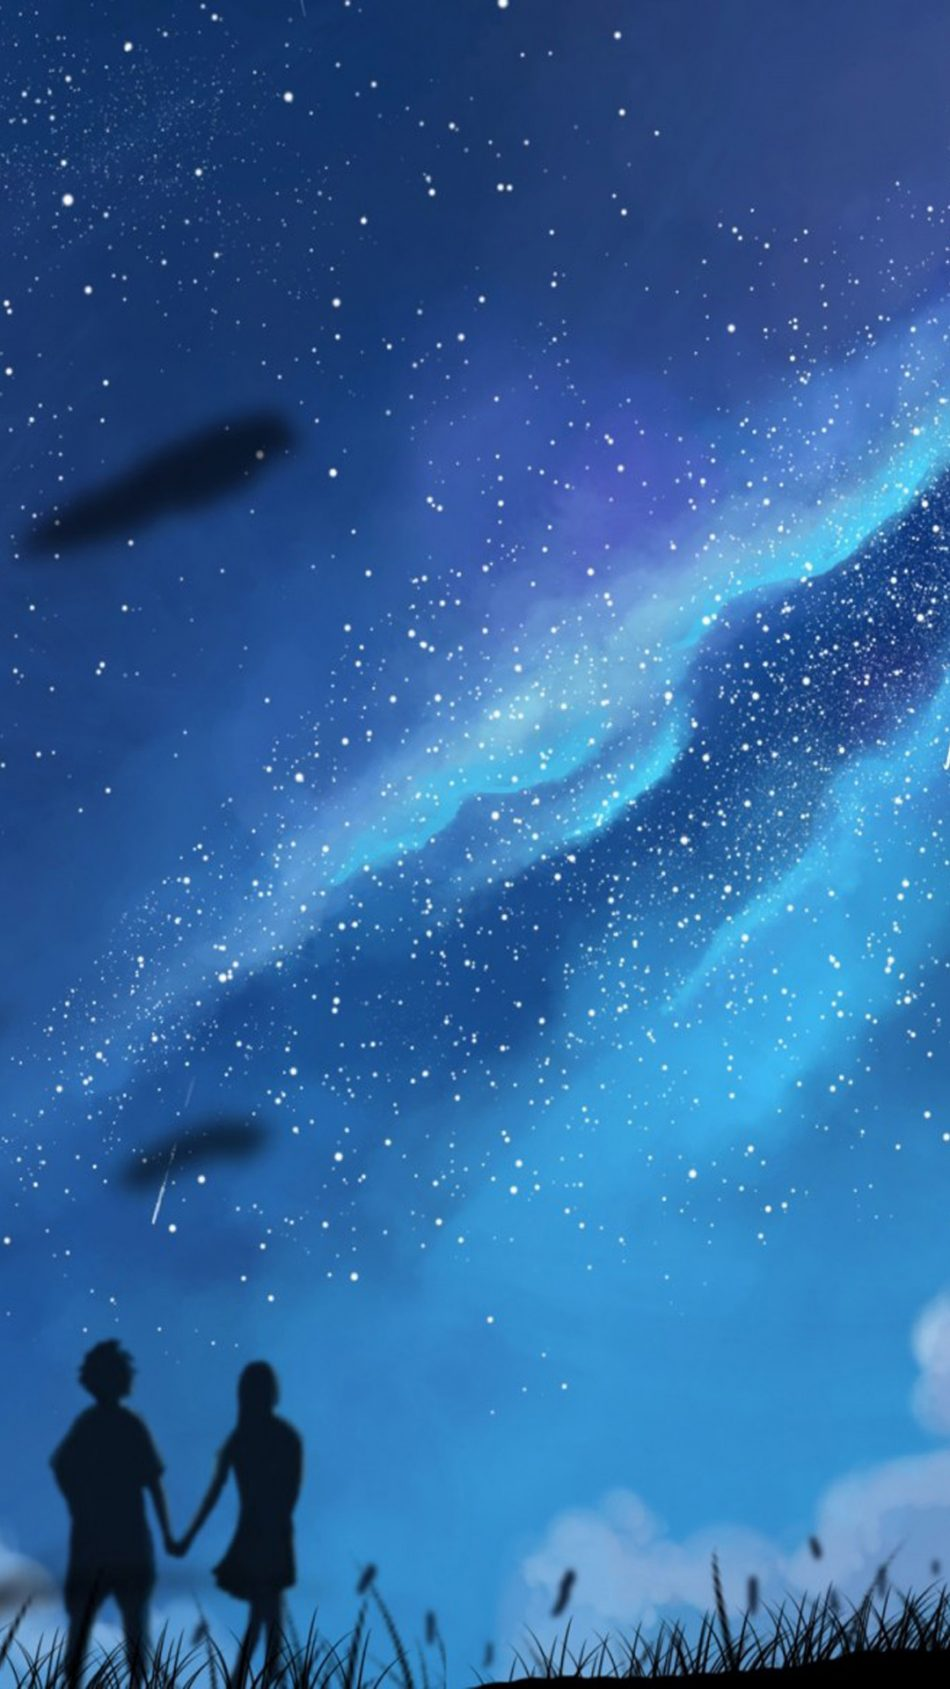 Couple Starry Sky Night Artwork 4K Ultra HD Mobile Wallpaper